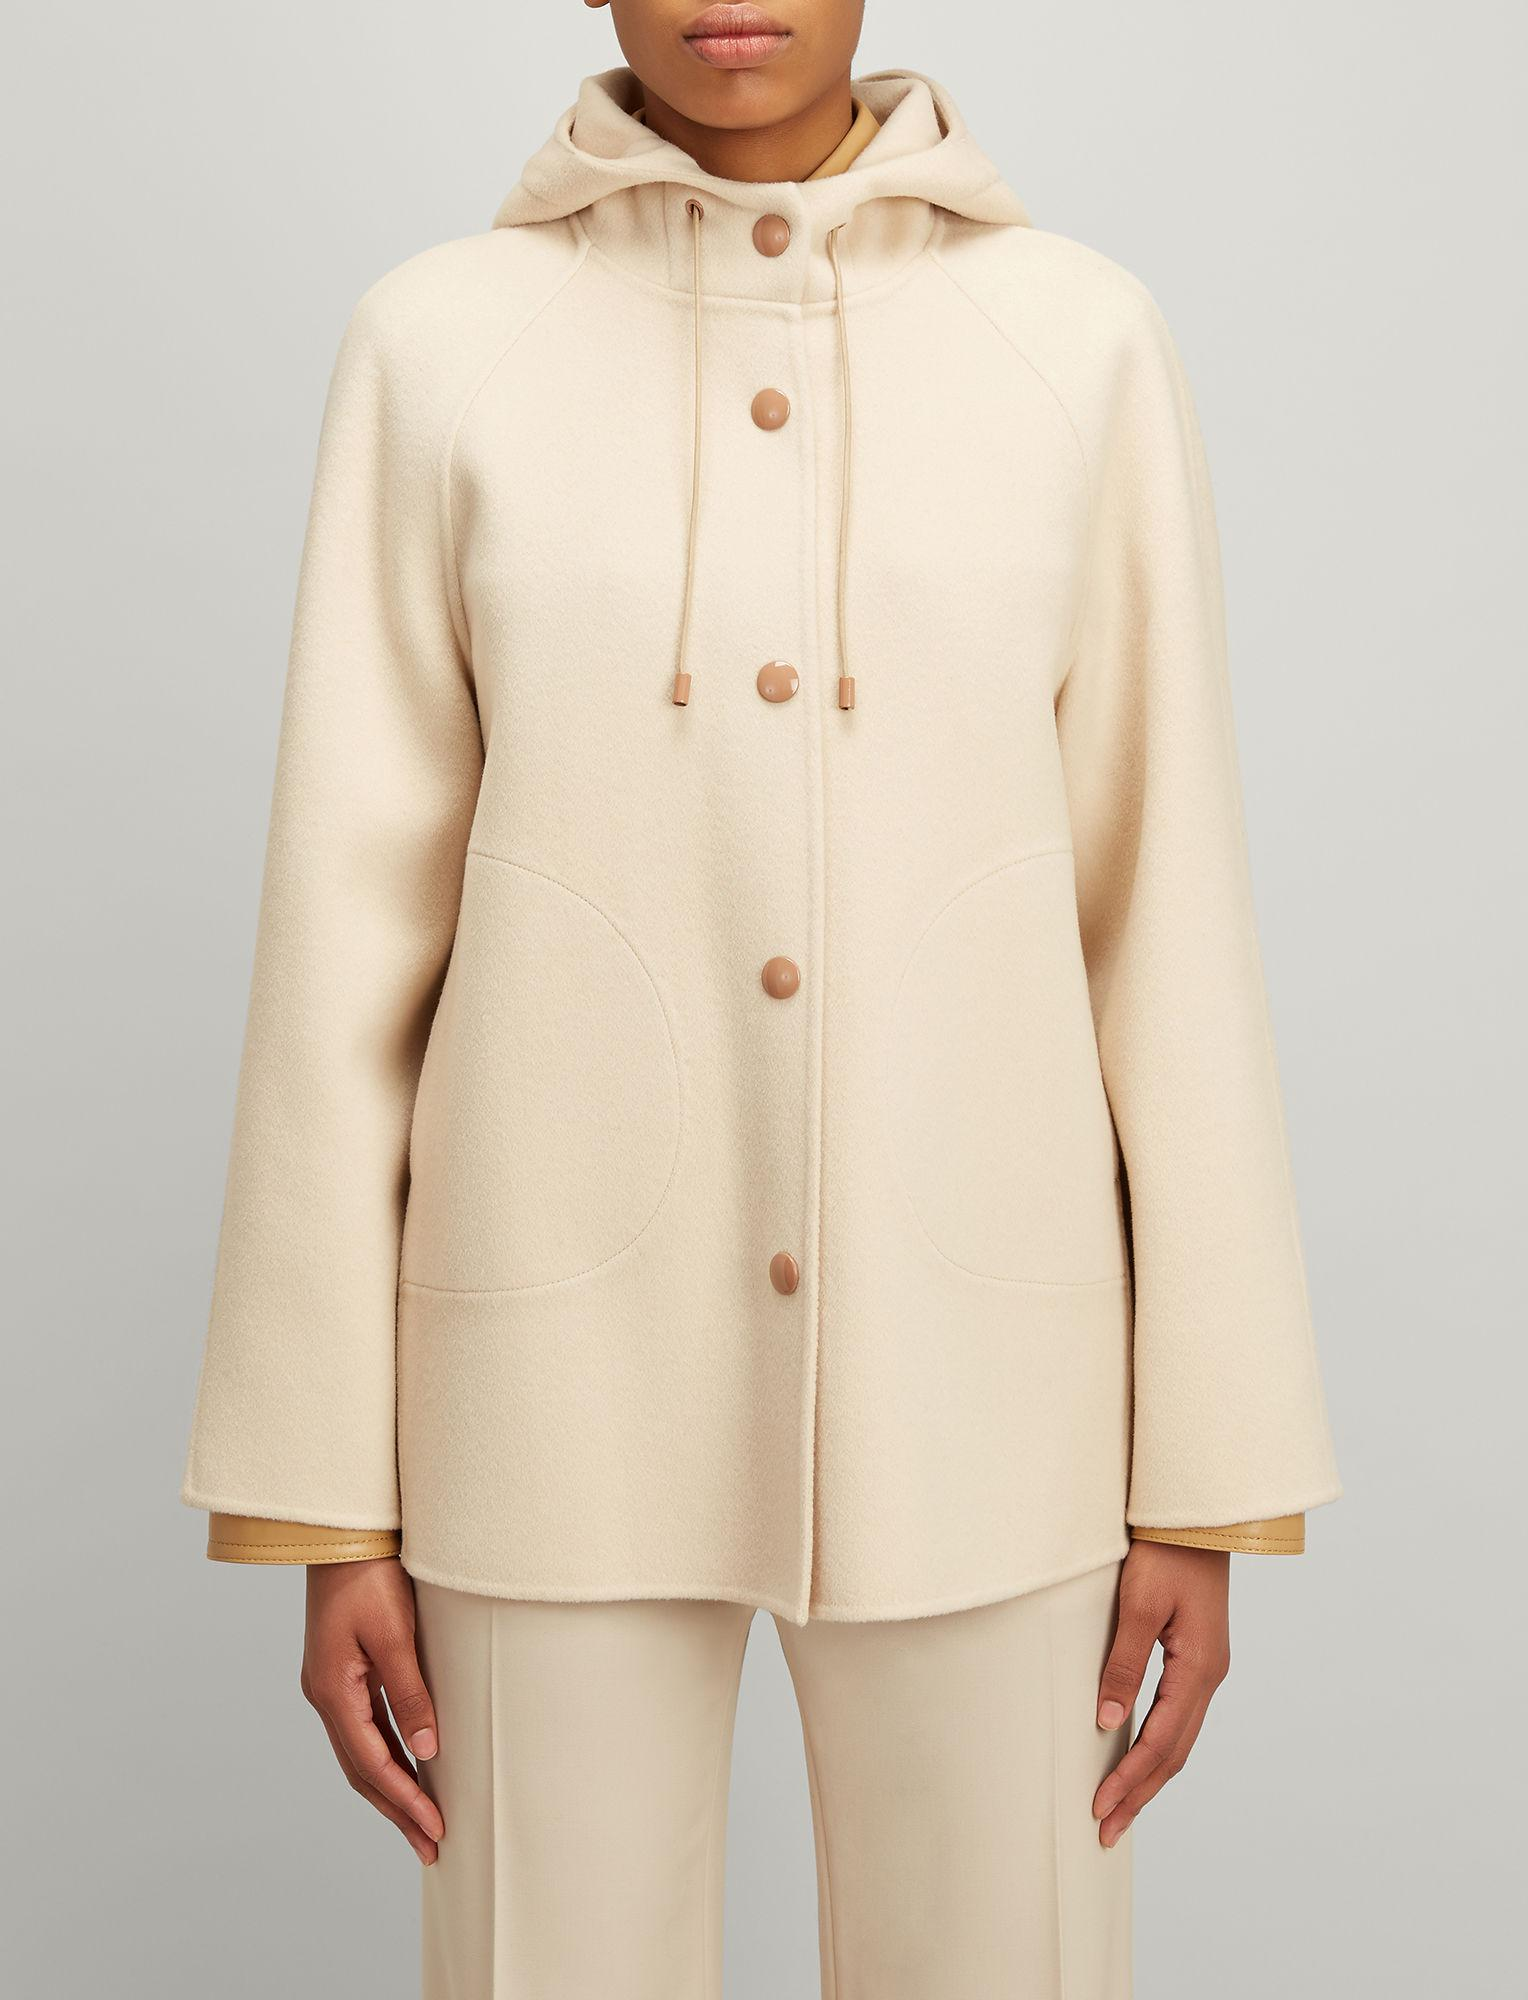 7d764237c61 JOSEPH Double Wool Rowen Short Coat in Natural - Lyst